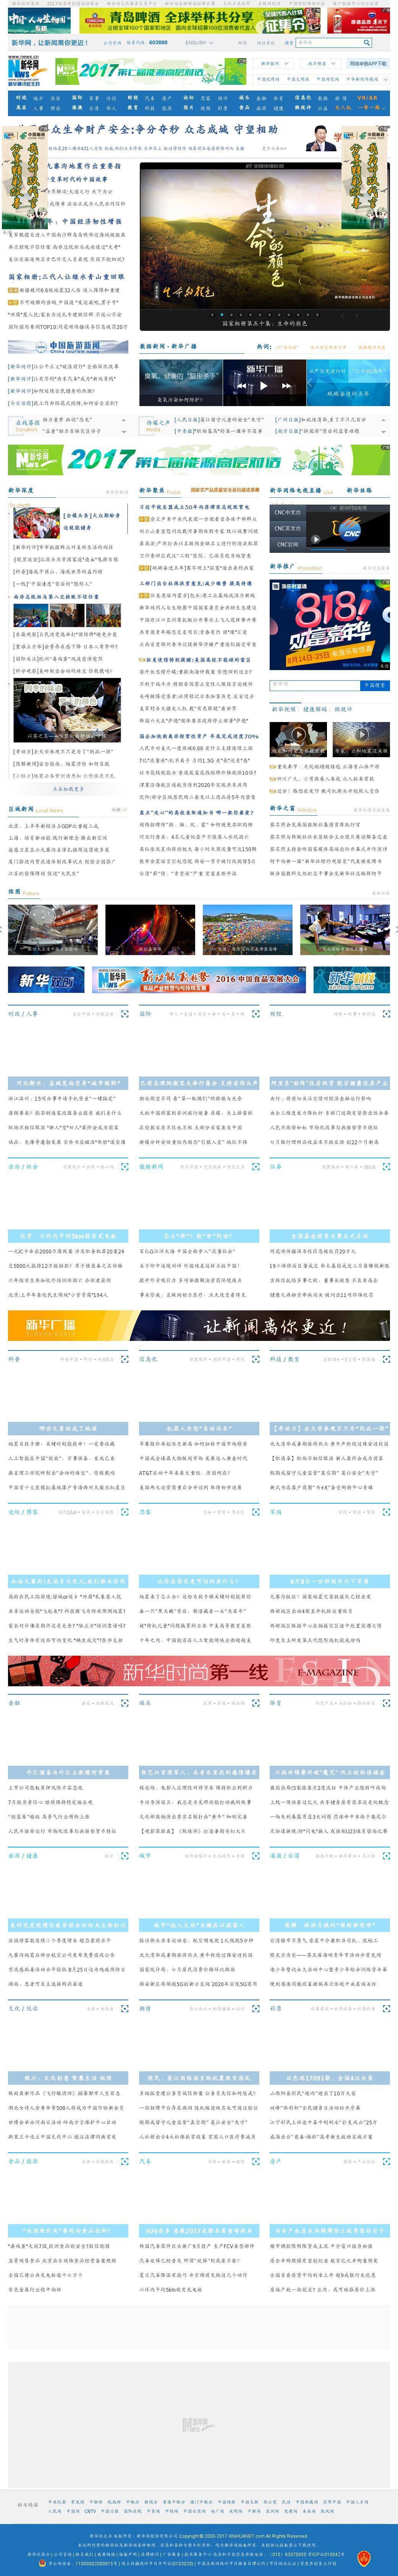 Xinhua at Thursday Aug. 10, 2017, 11:24 p.m. UTC